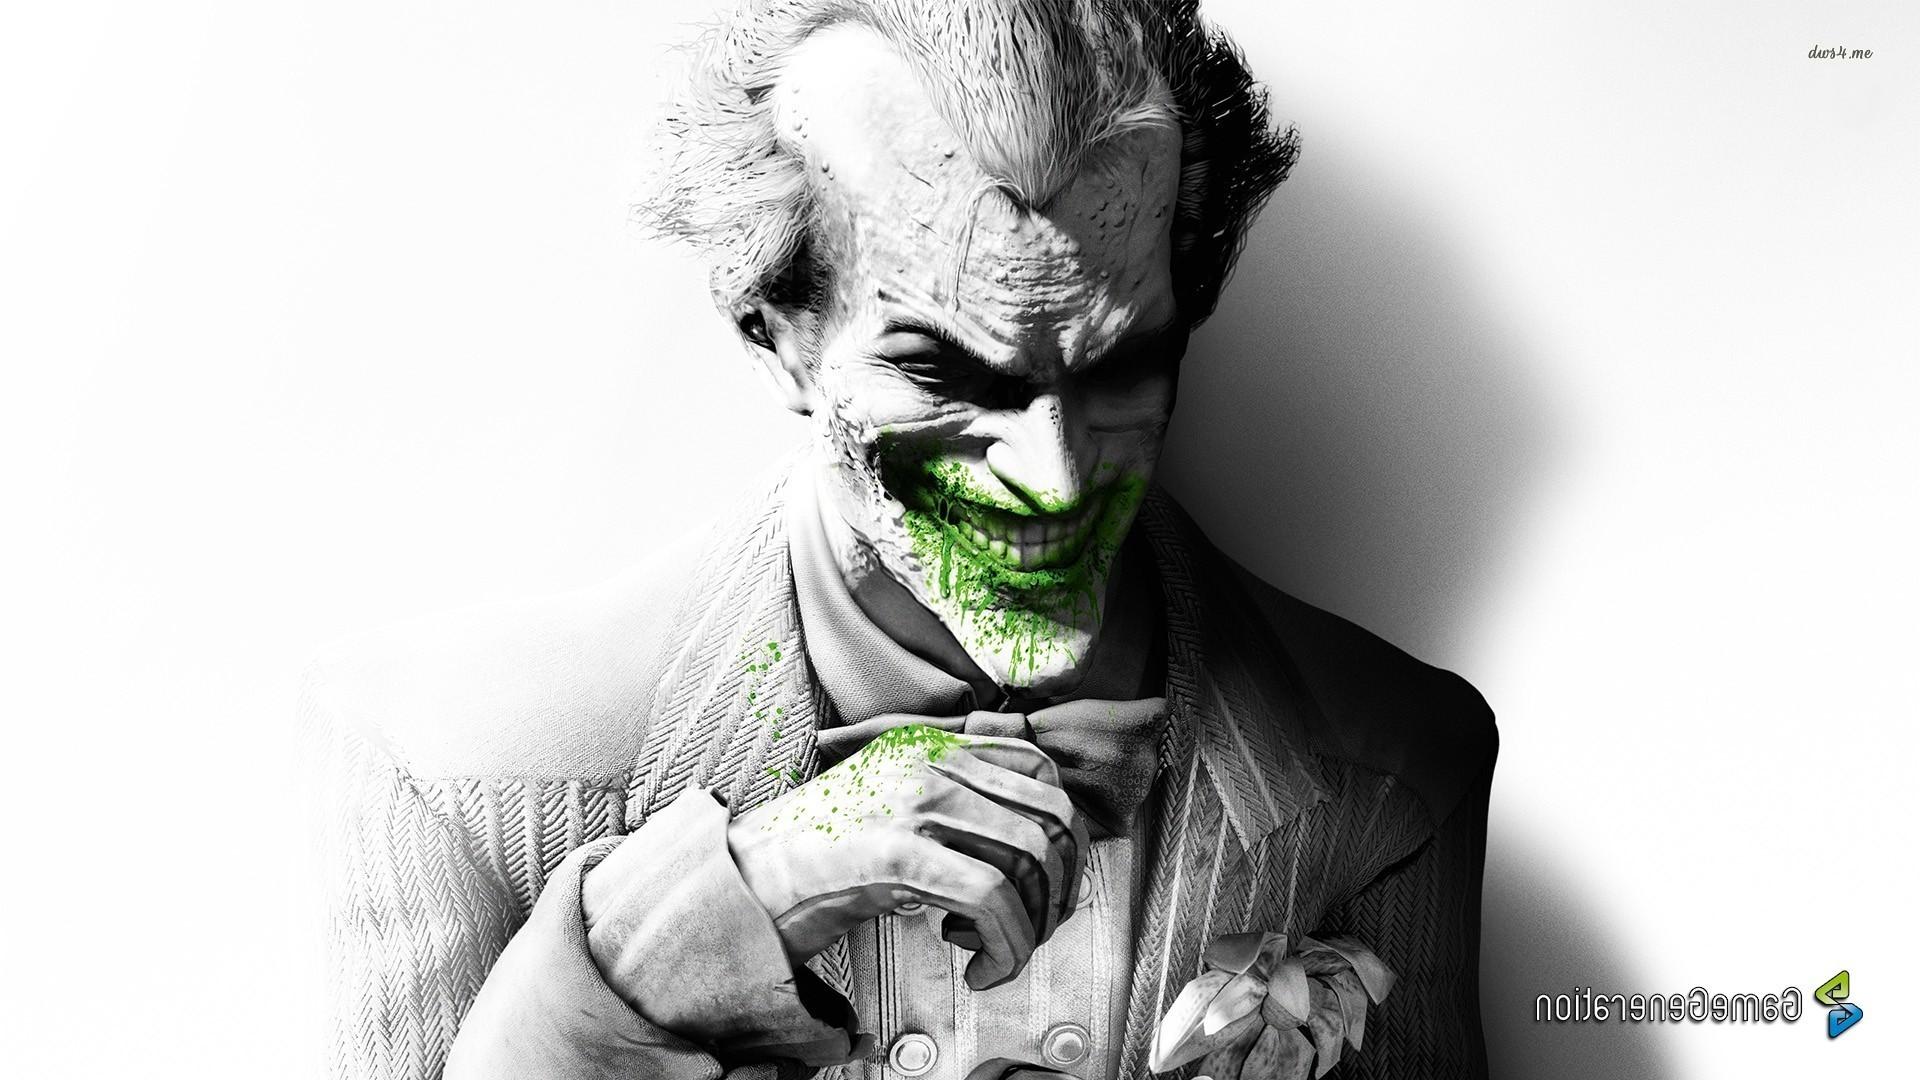 Joker HD Wallpapers Backgrounds Wallpaper 1920×1080 The Joker Wallpaper (54  Wallpapers) |